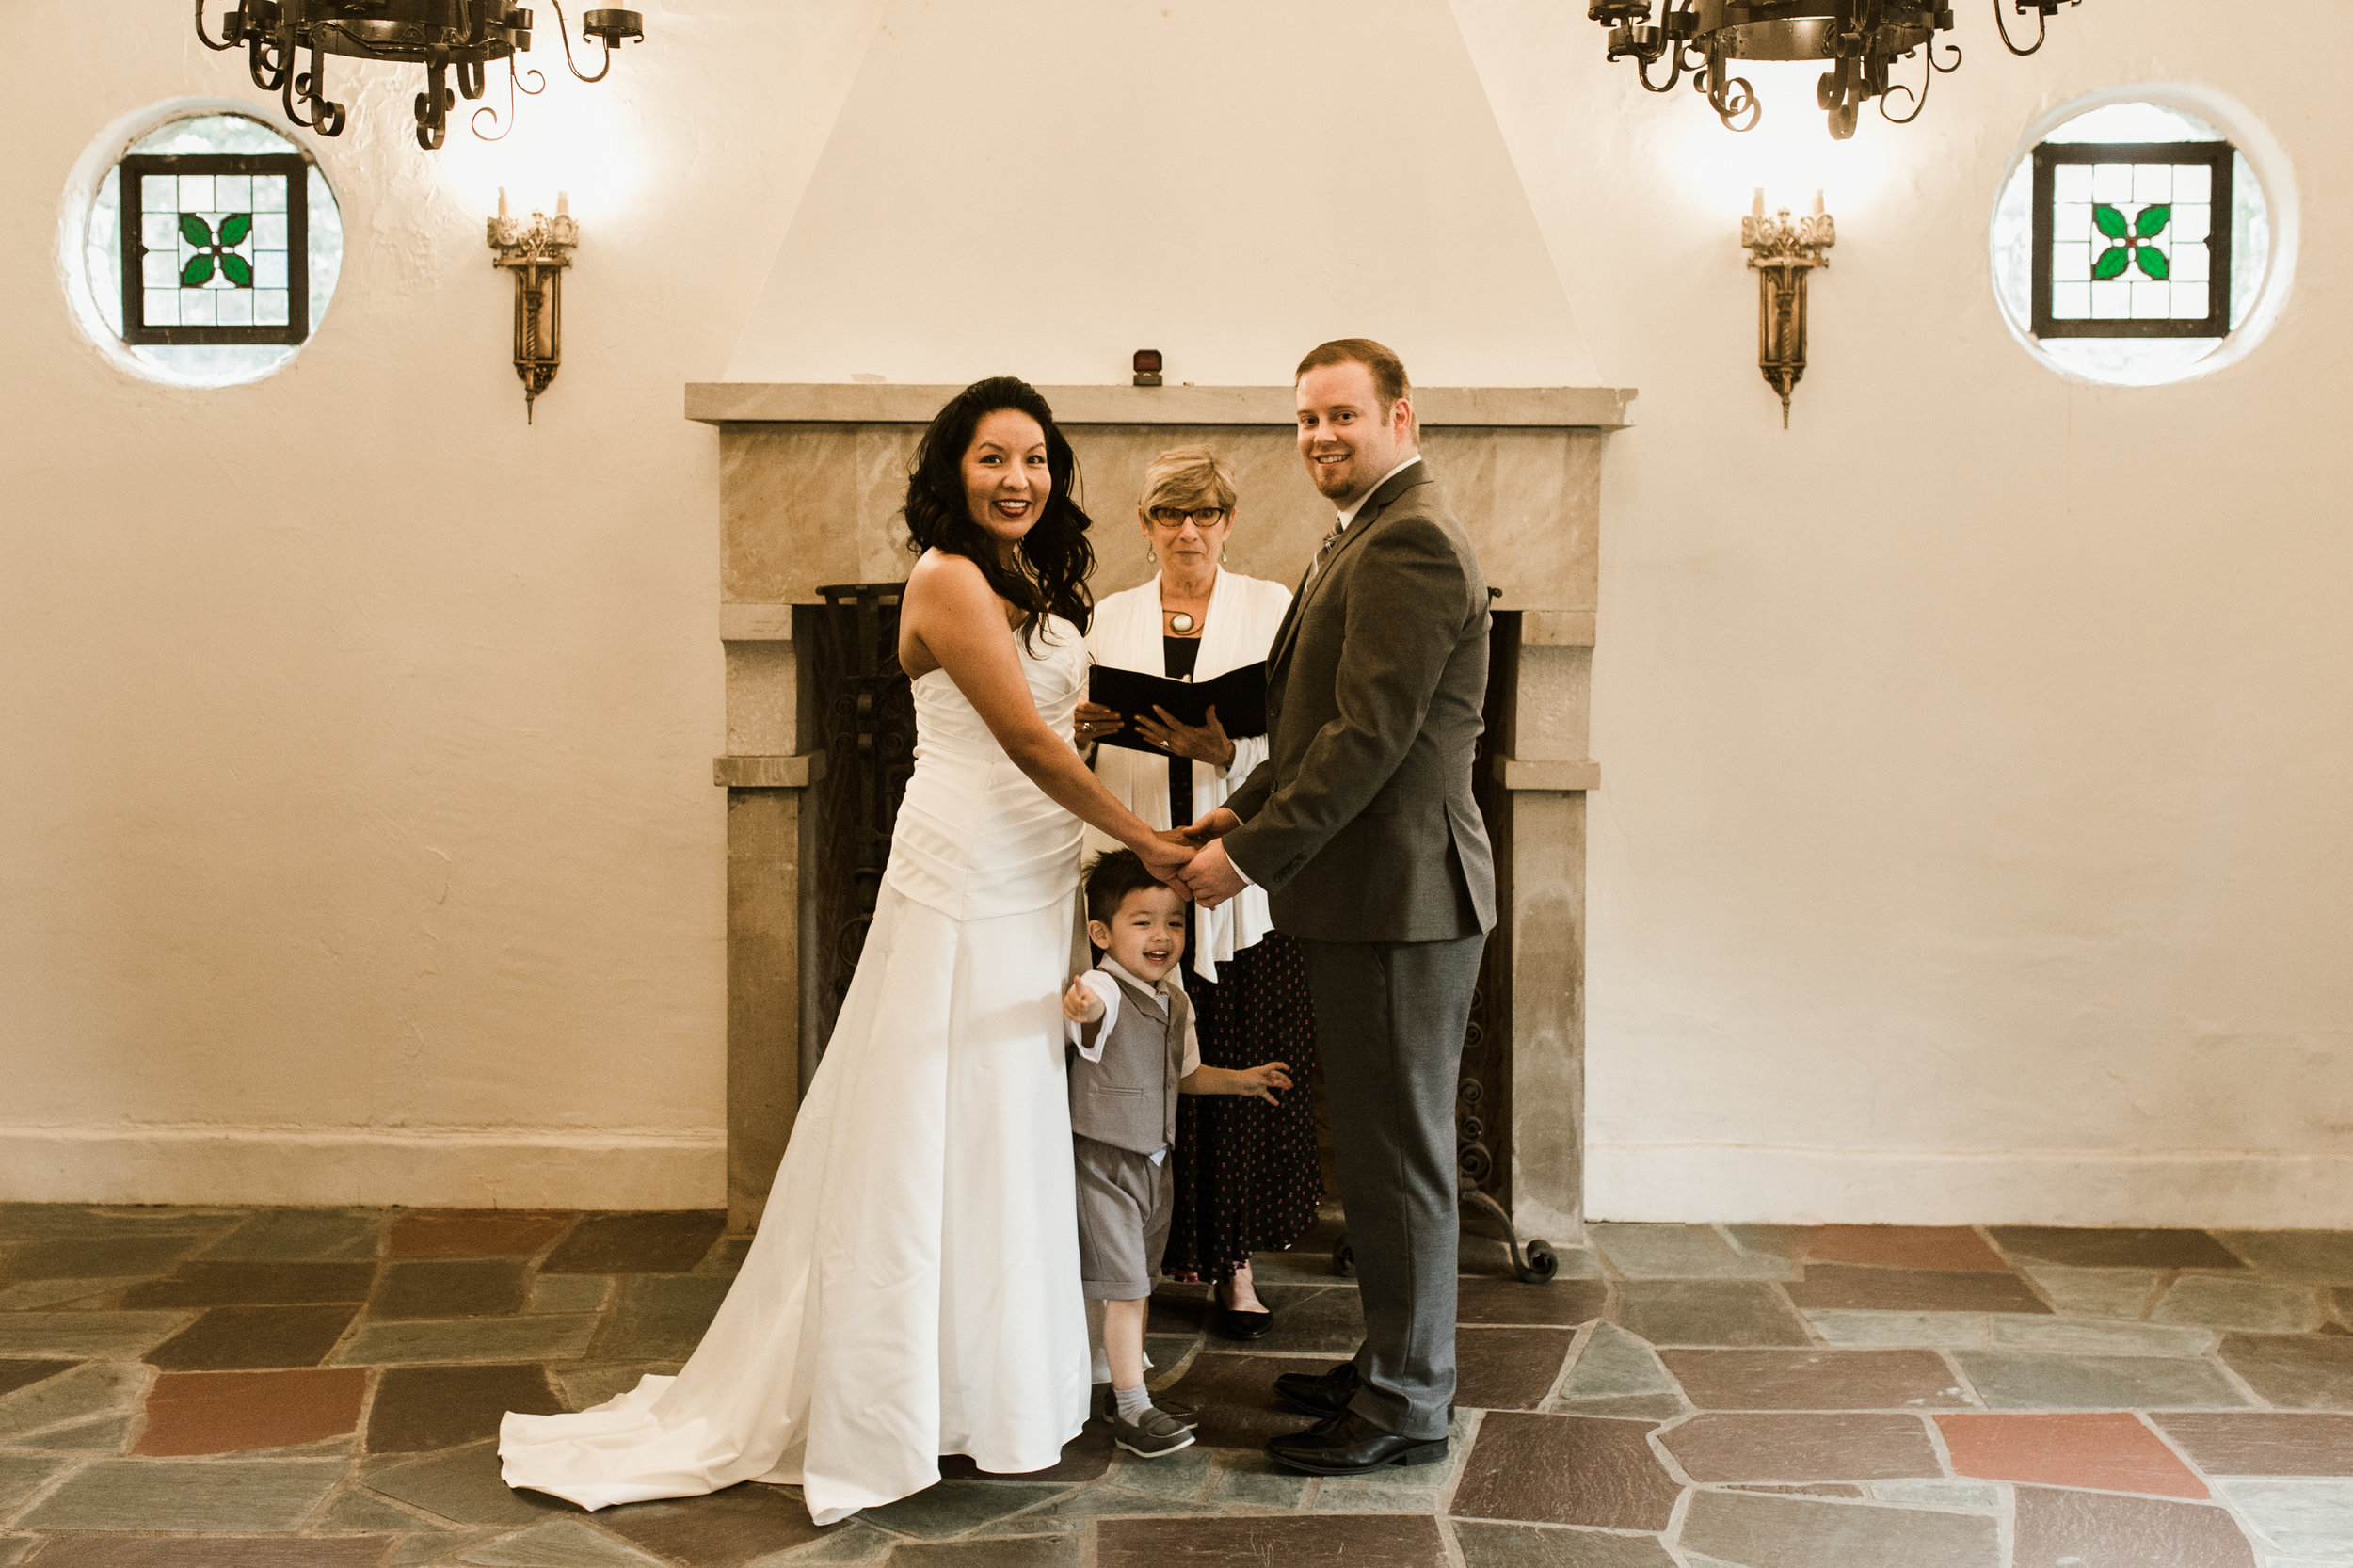 Kentucky Wedding Louisville Wedding Photographer 2018 Crystal Ludwick Photo Louisville Wedding Photographer Kentucky Wedding Photographer (36 of 76).jpg